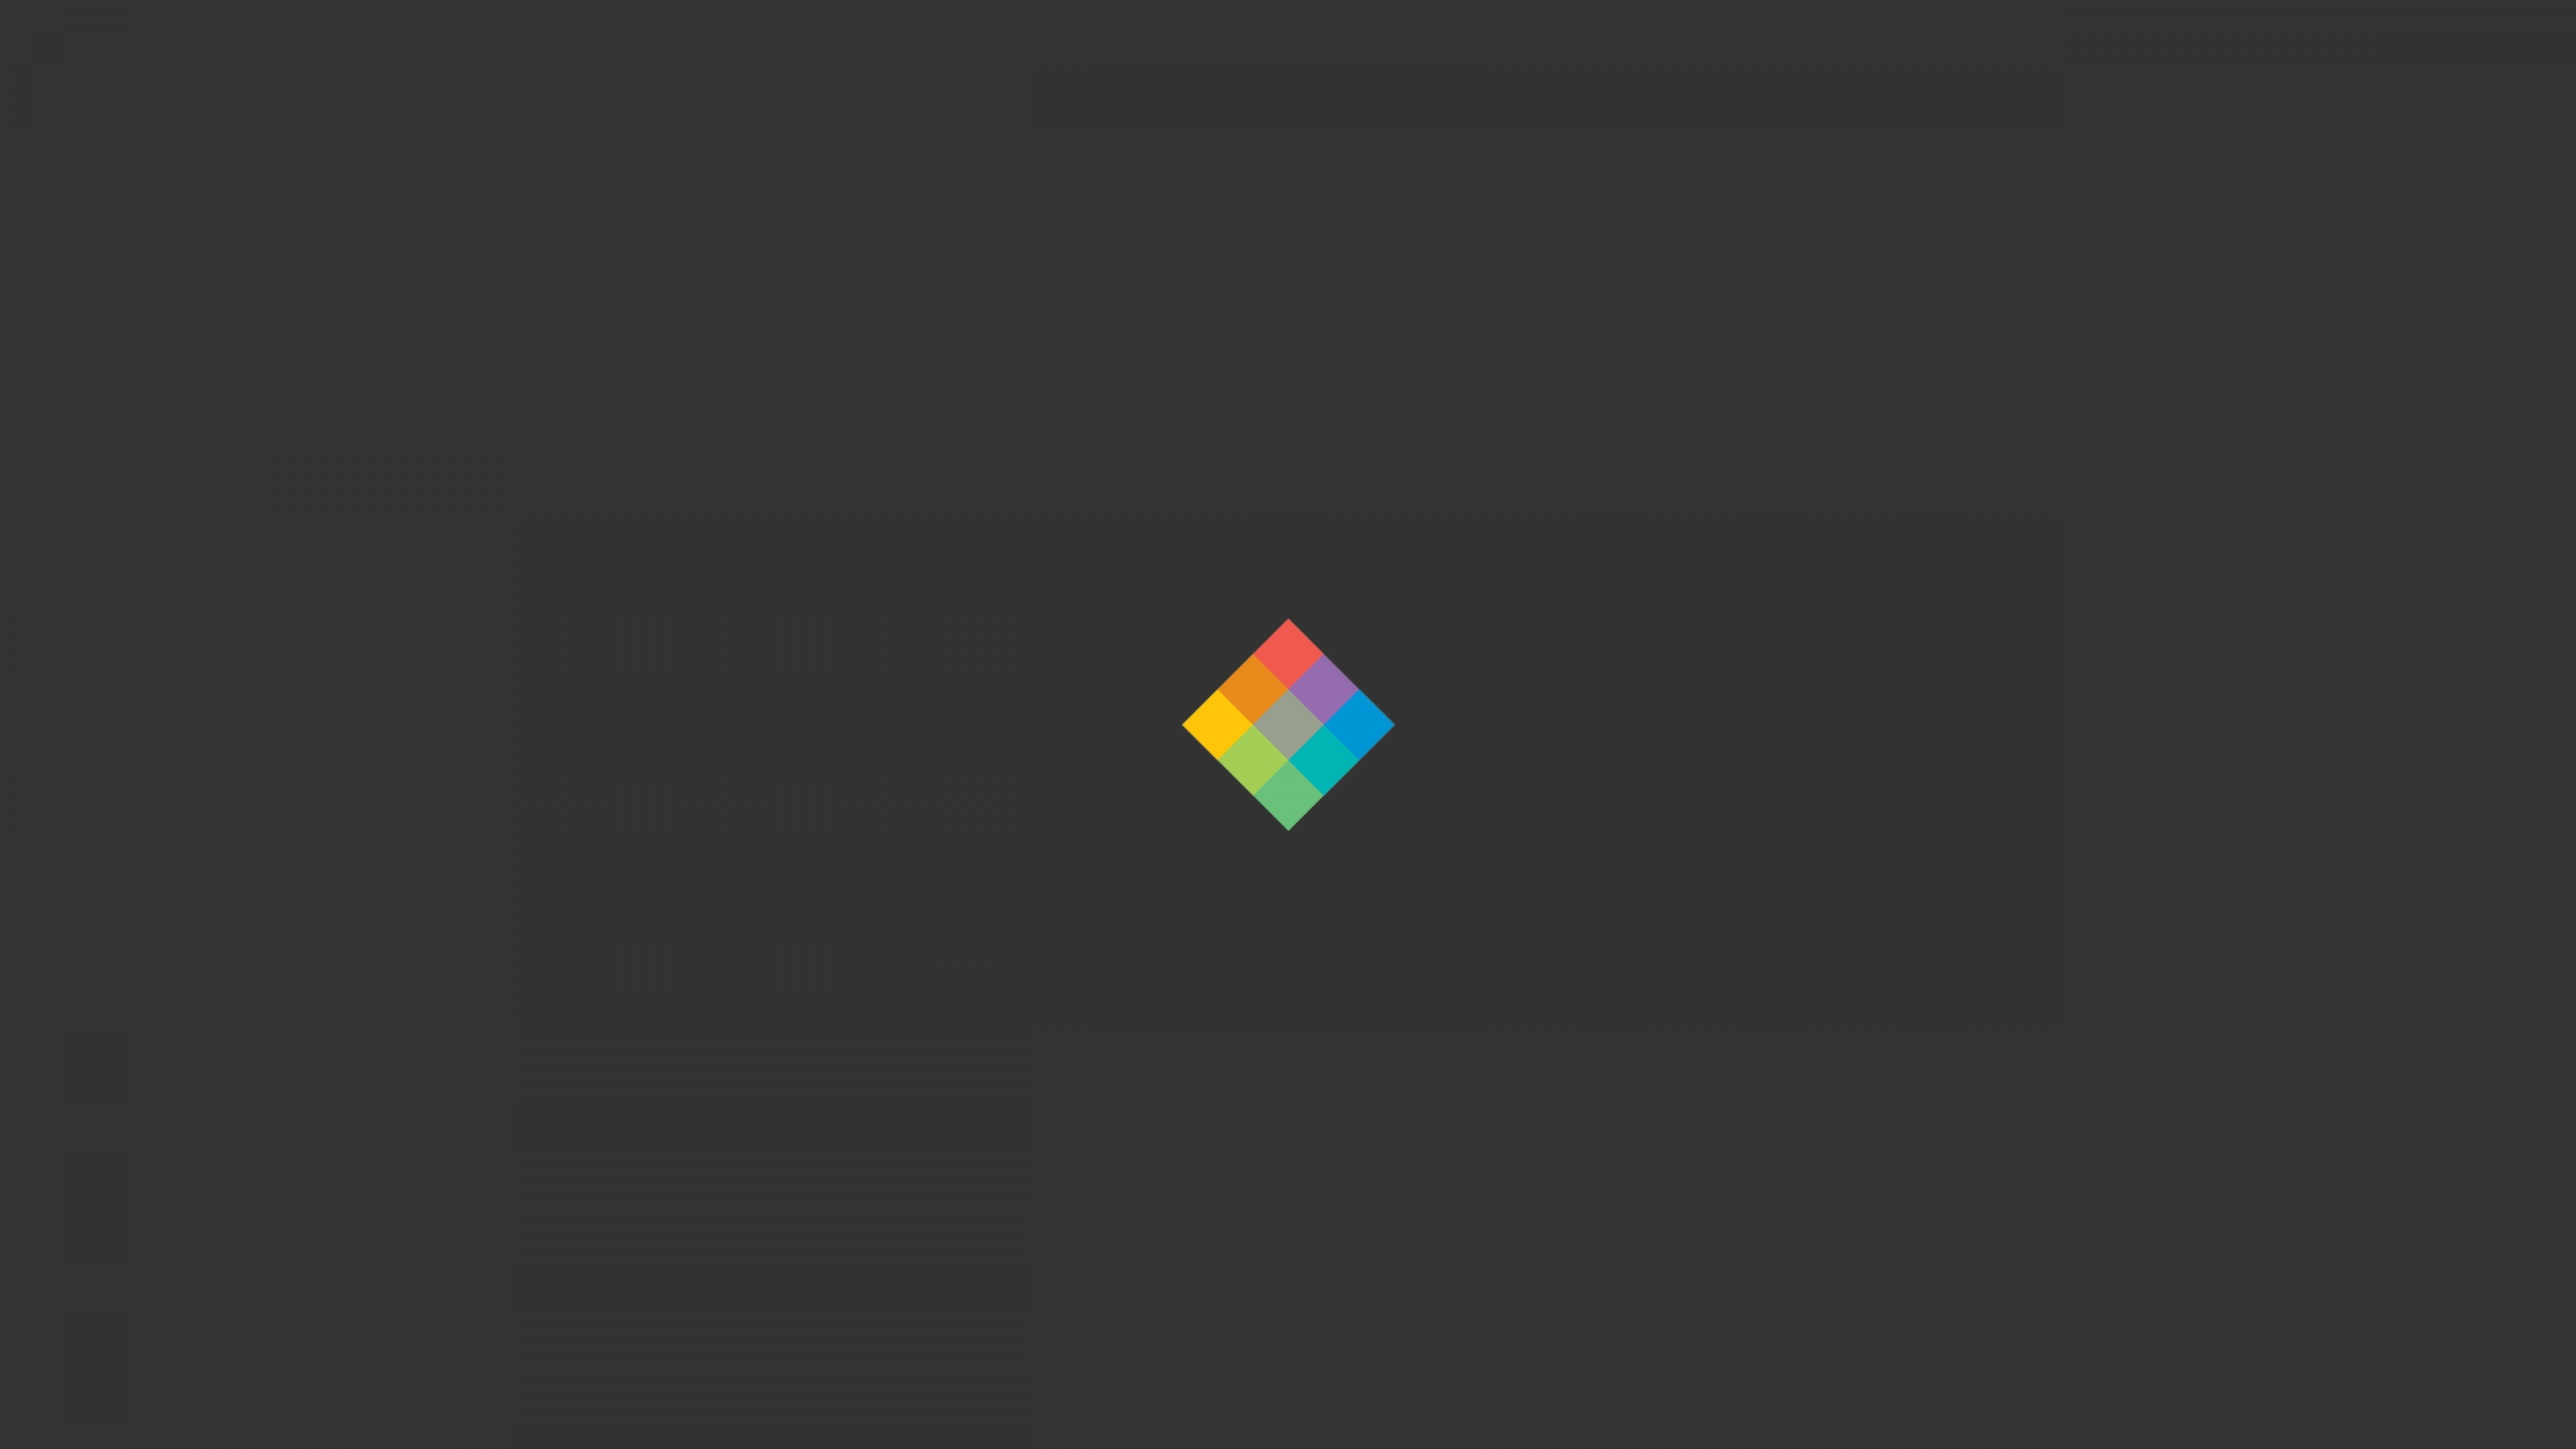 Minimalist cube, Bright, Background Wallpaper, Background 4K Ultra HD .